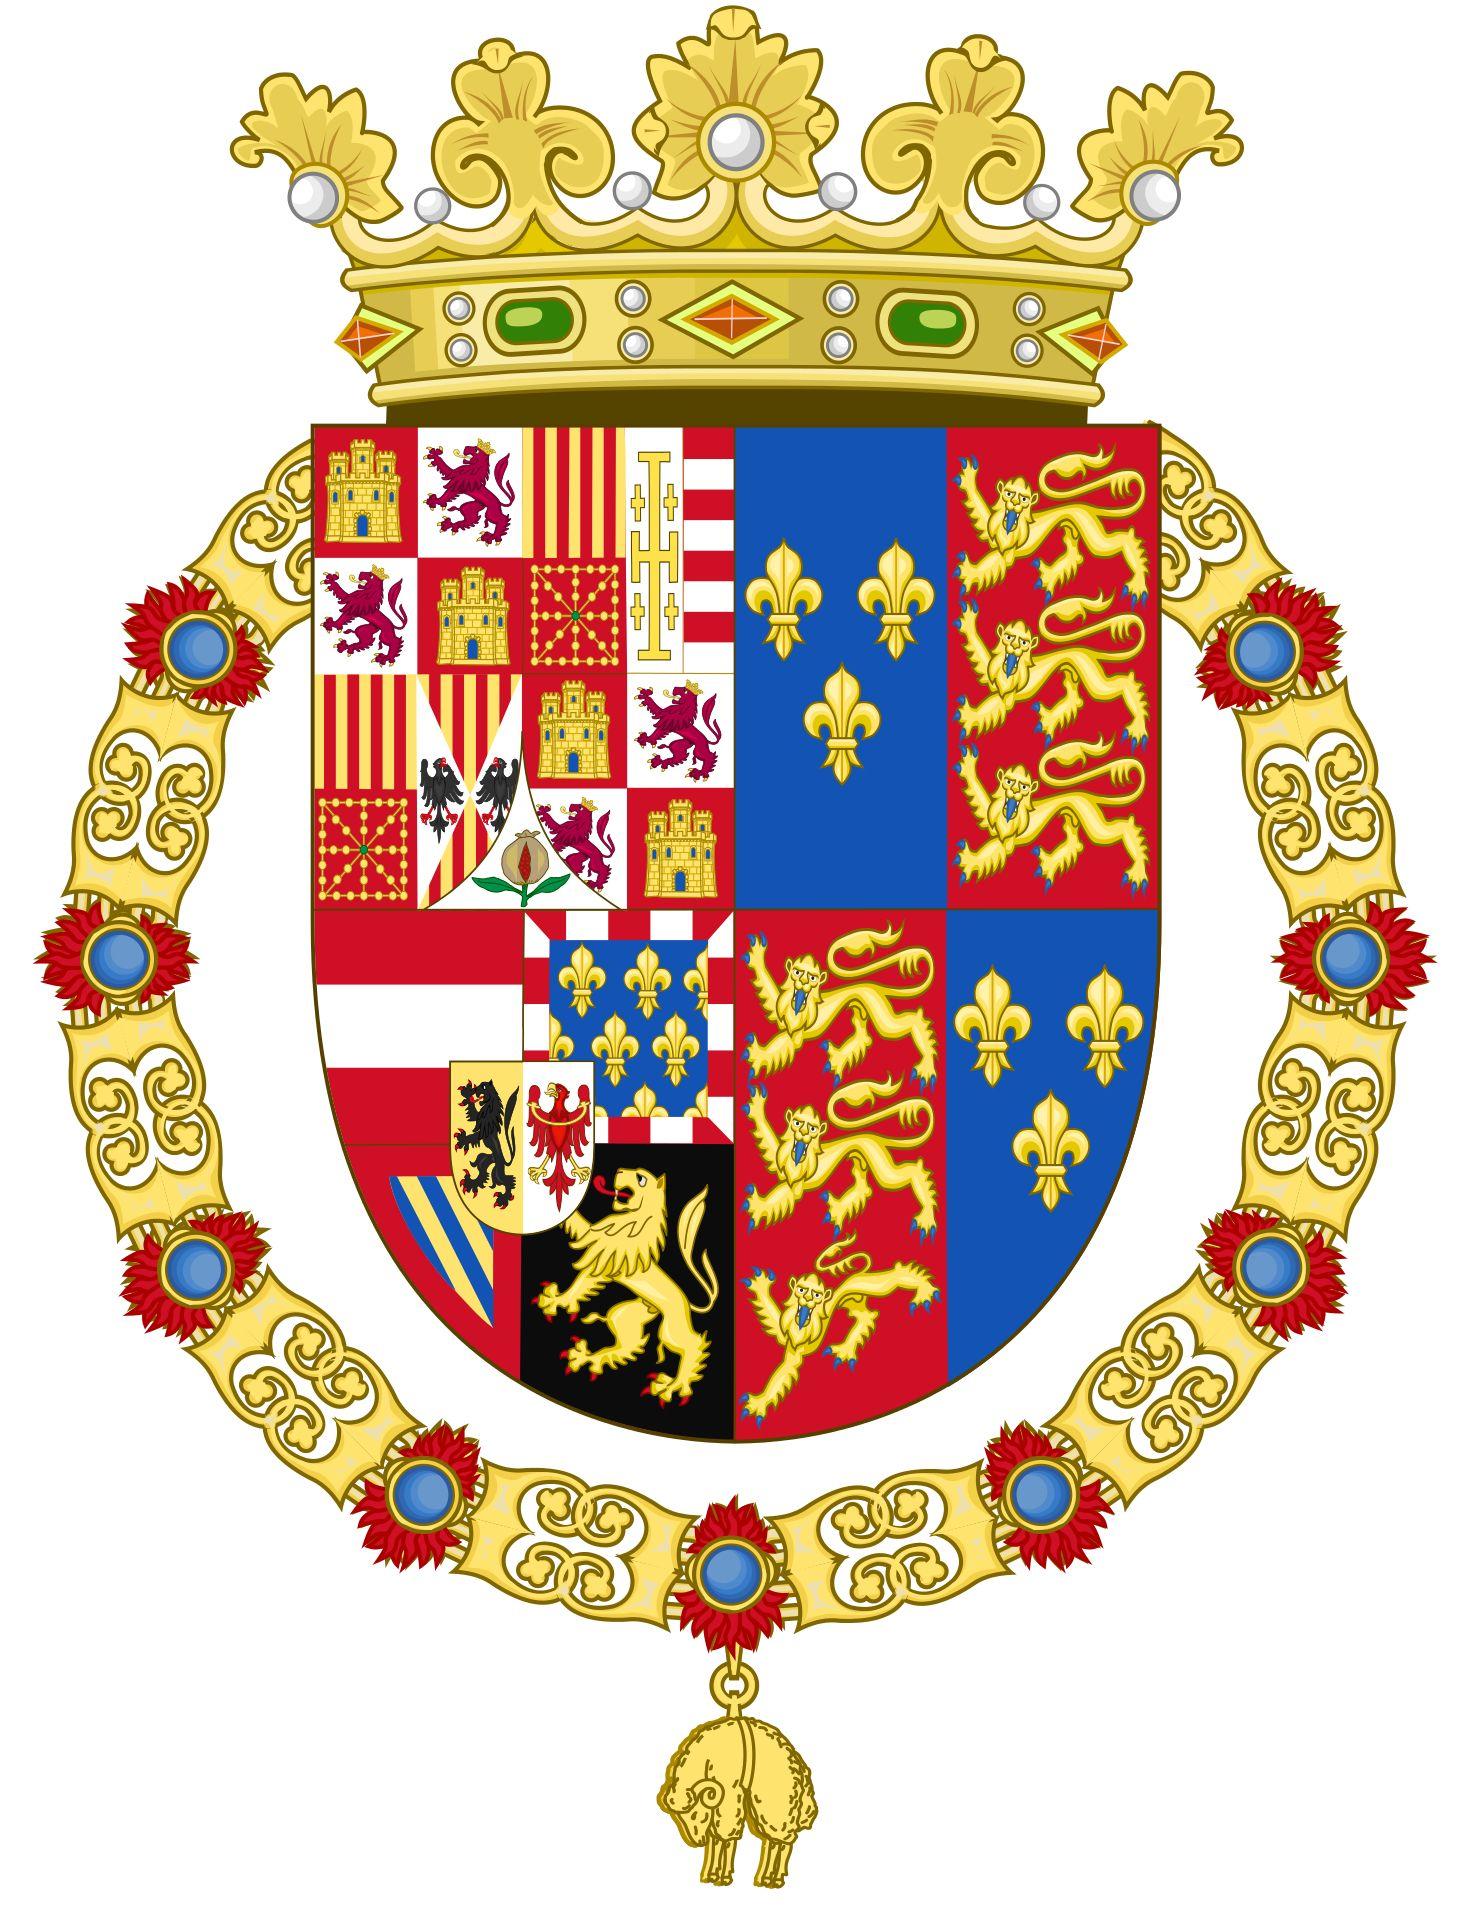 Coat of arms of Philip Ii of Spain